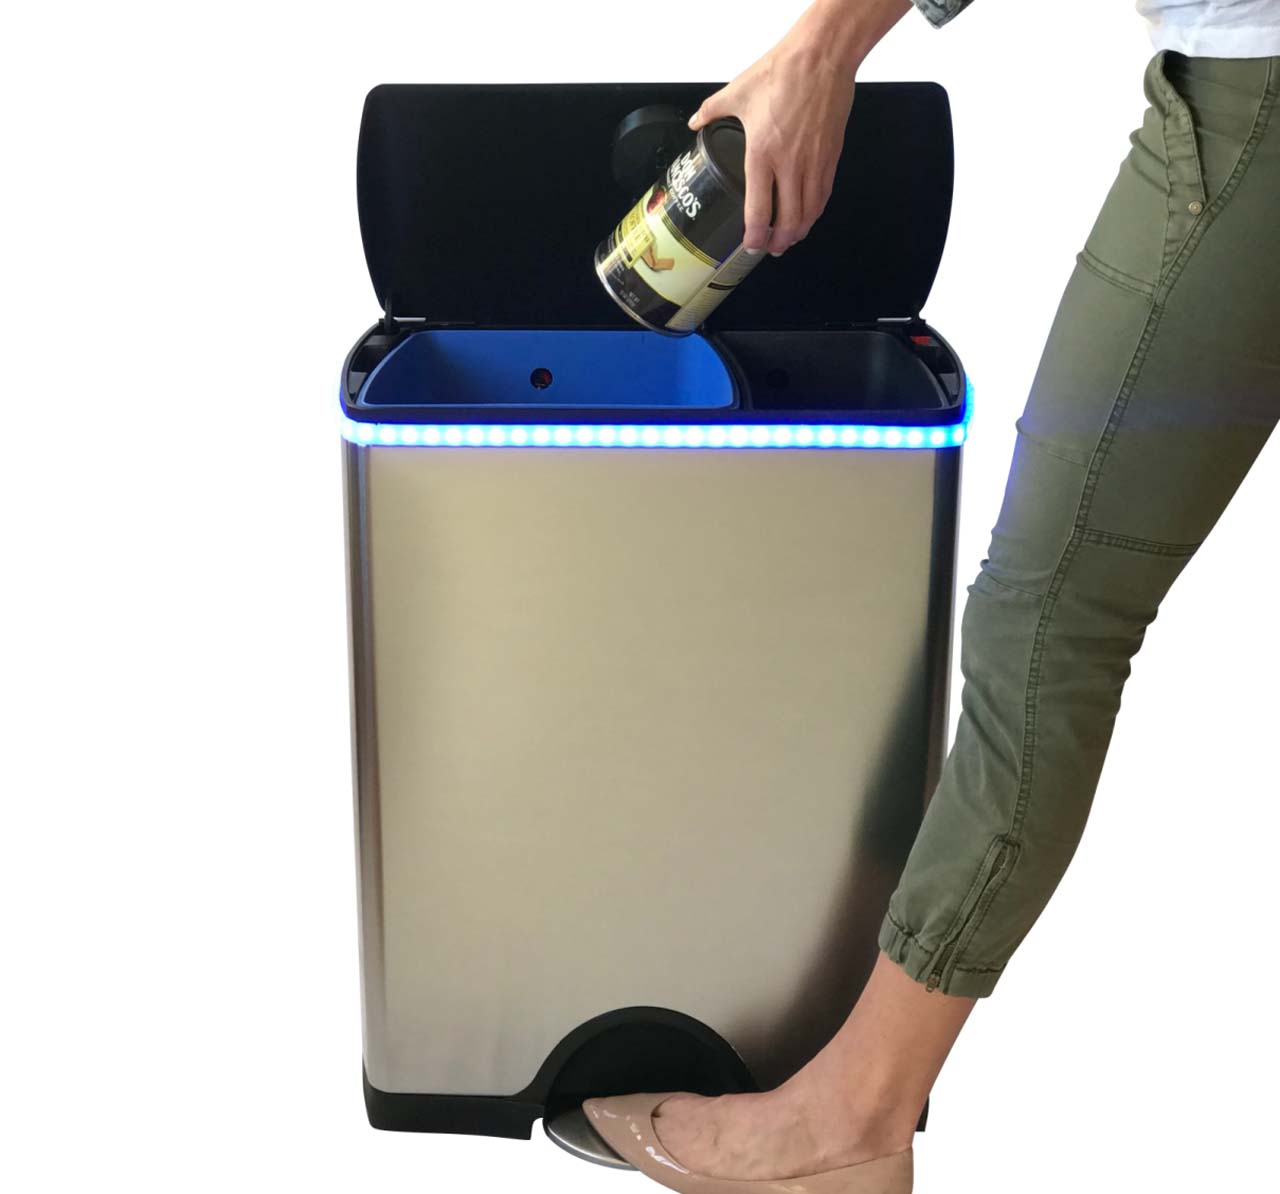 Garbi smart garbage and recycling bin